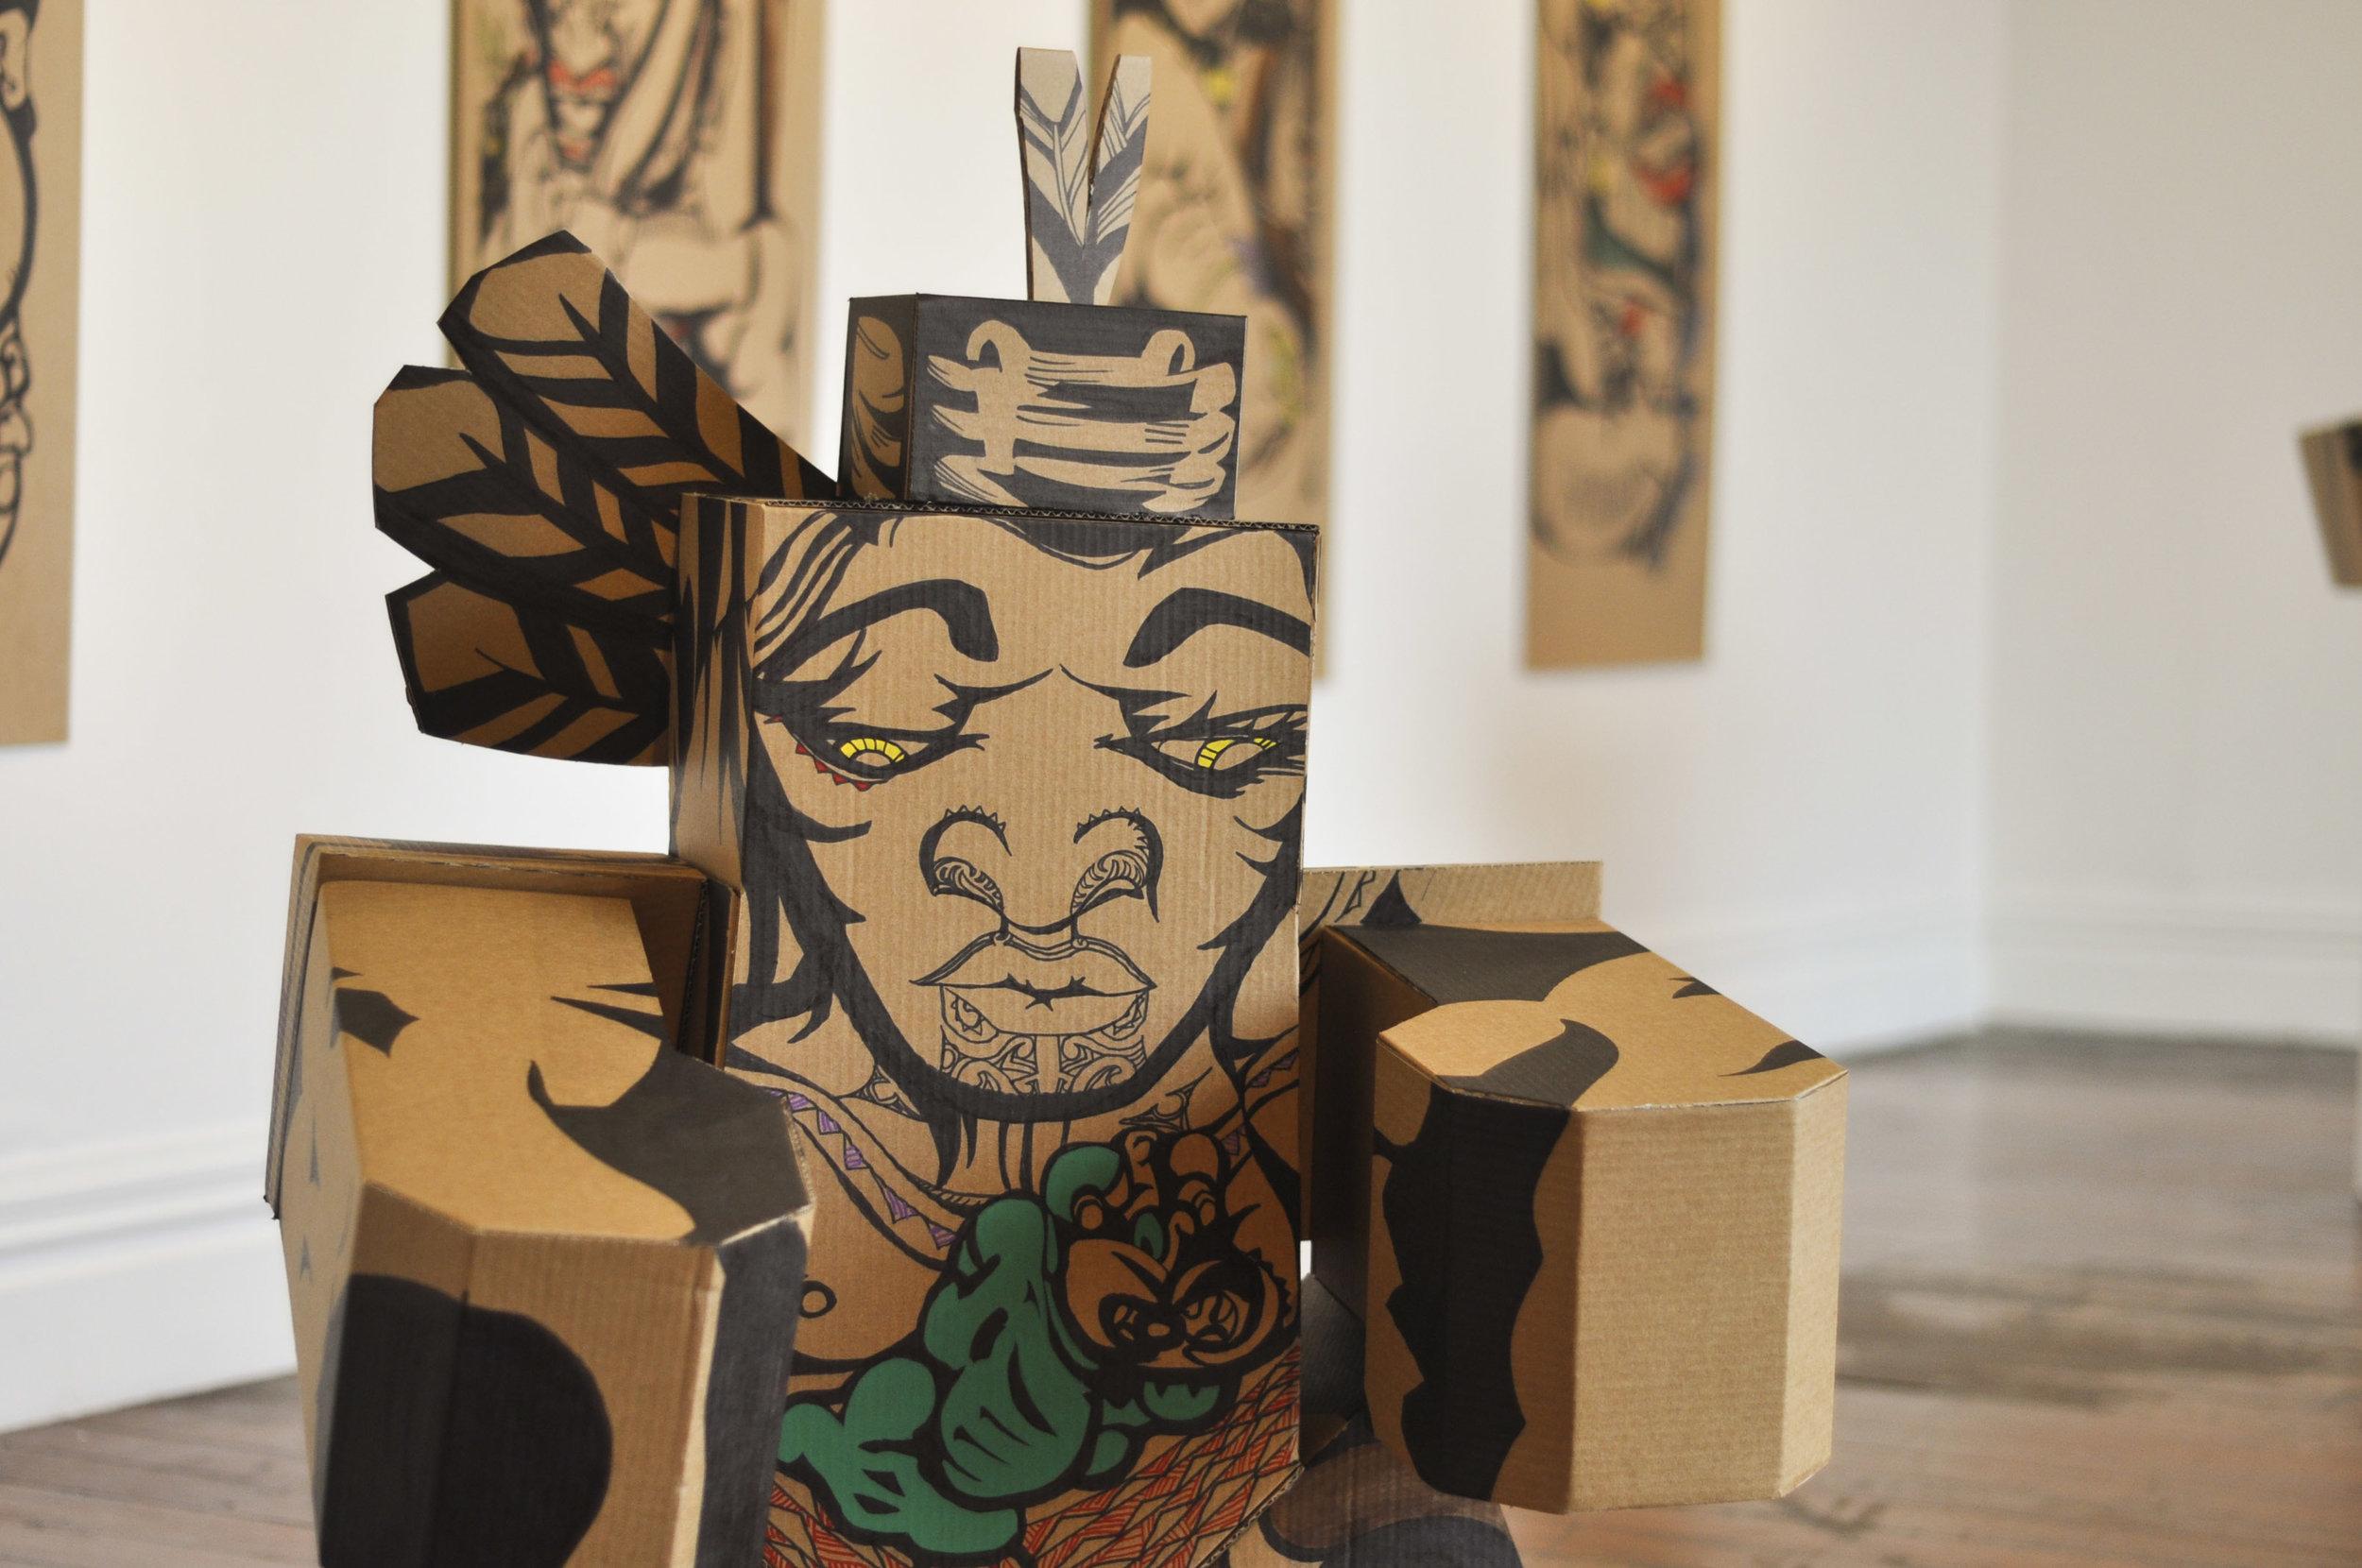 Reweti Arapere  Rakau Matarau  installation view. Image courtesy of the artist and Enjoy Gallery.